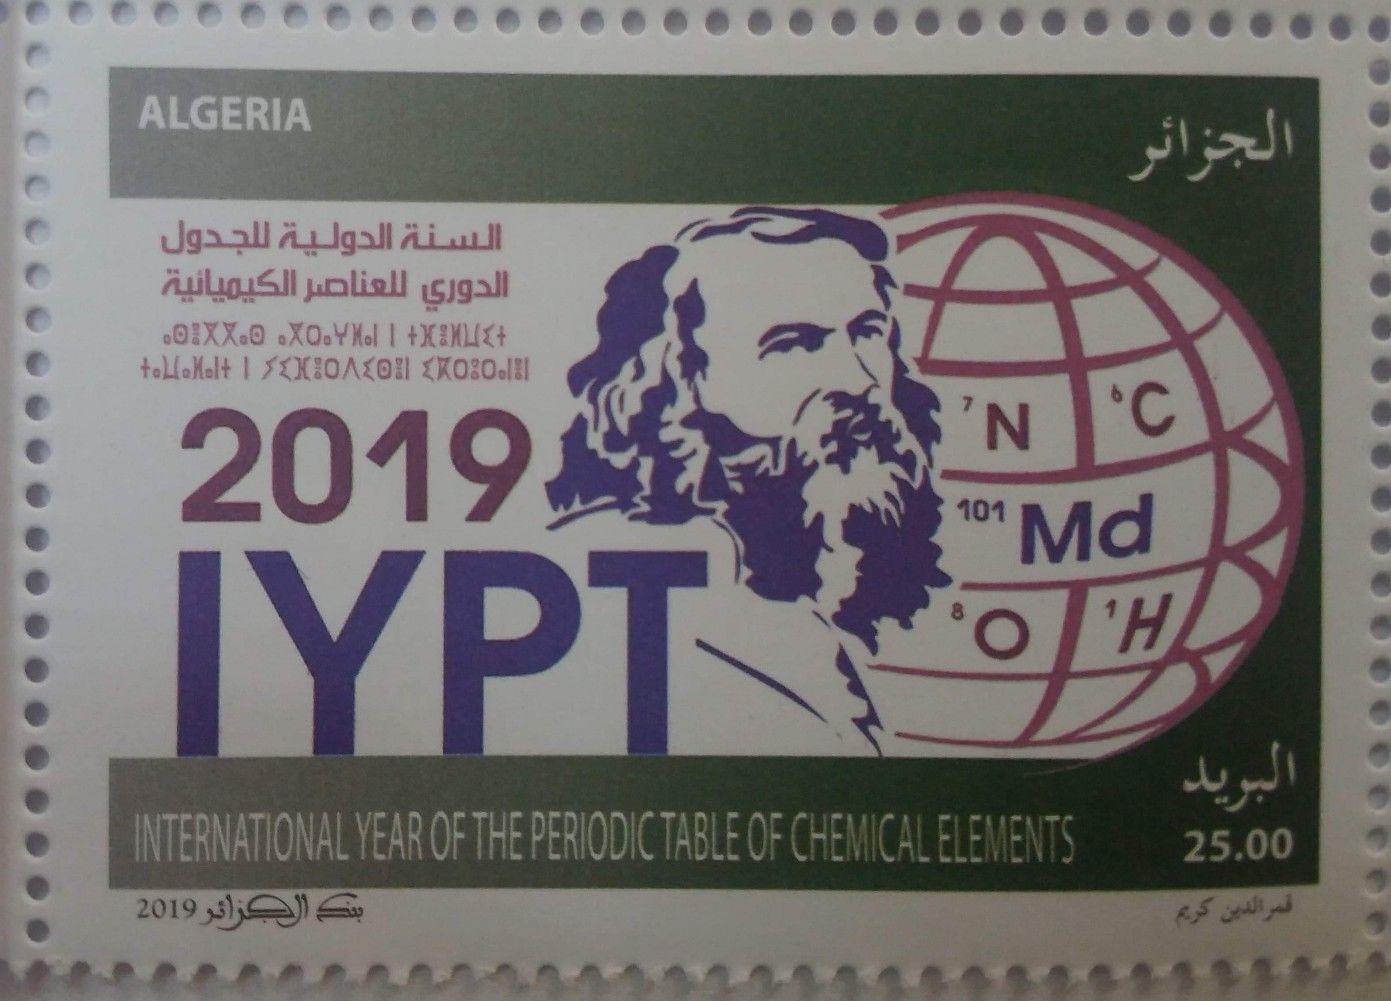 Algeria - International Year of the Periodic Table (January 2, 2019)